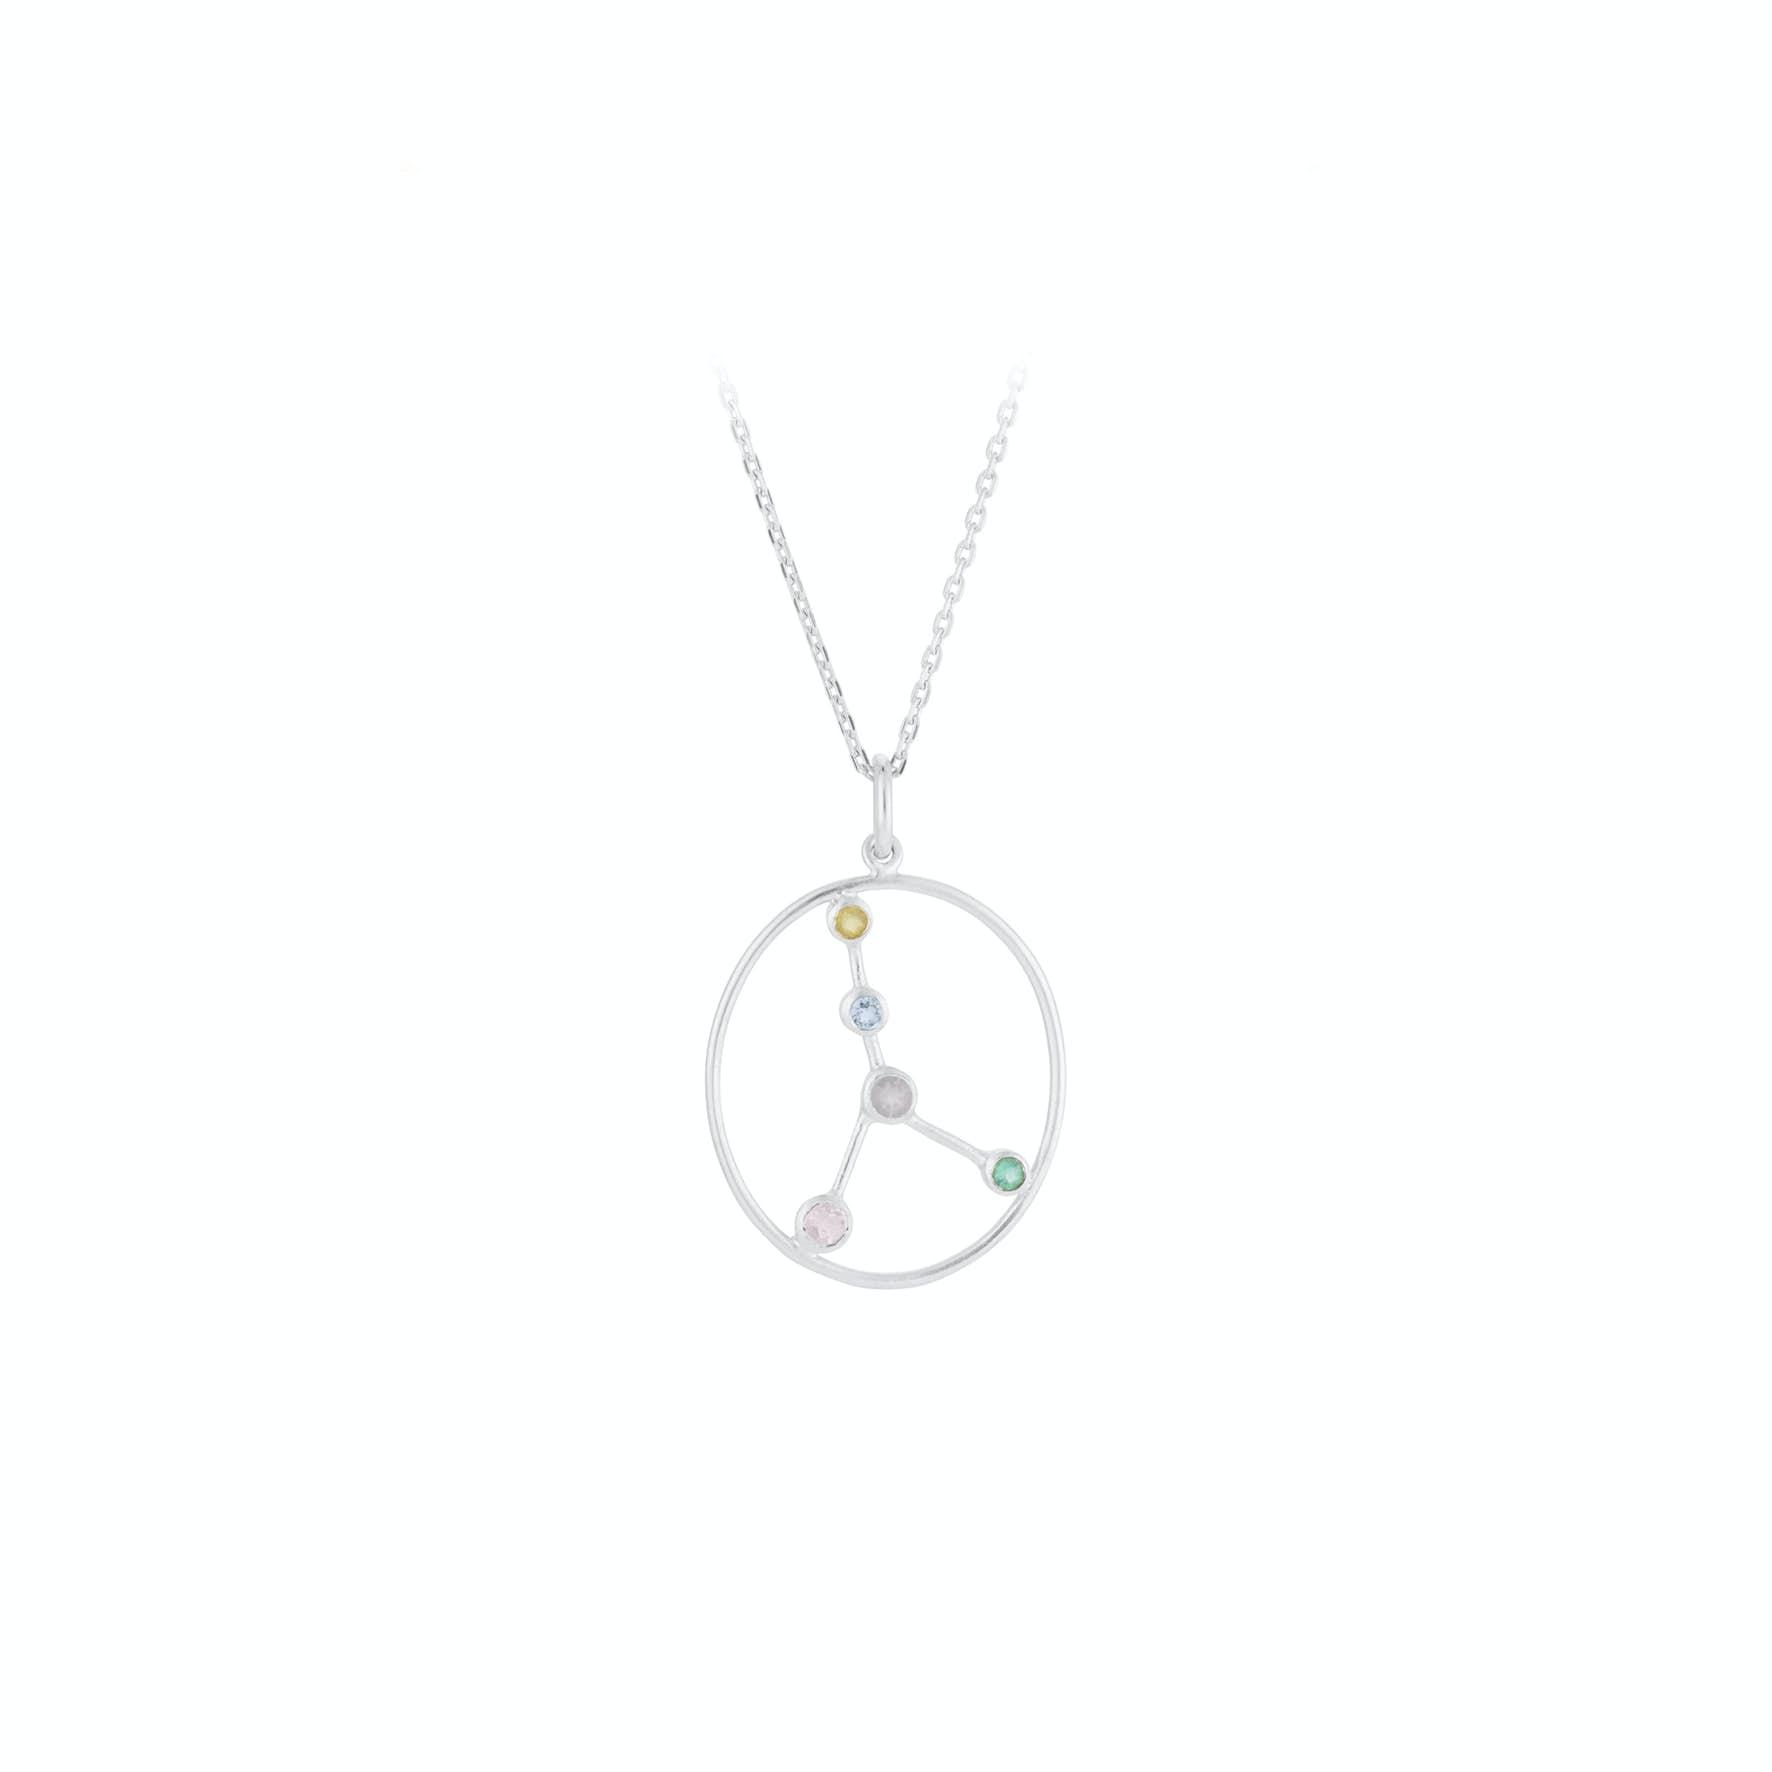 Zodiac Cancer Necklace (Jun 22 - Jul 21) von Pernille Corydon in Silber Sterling 925